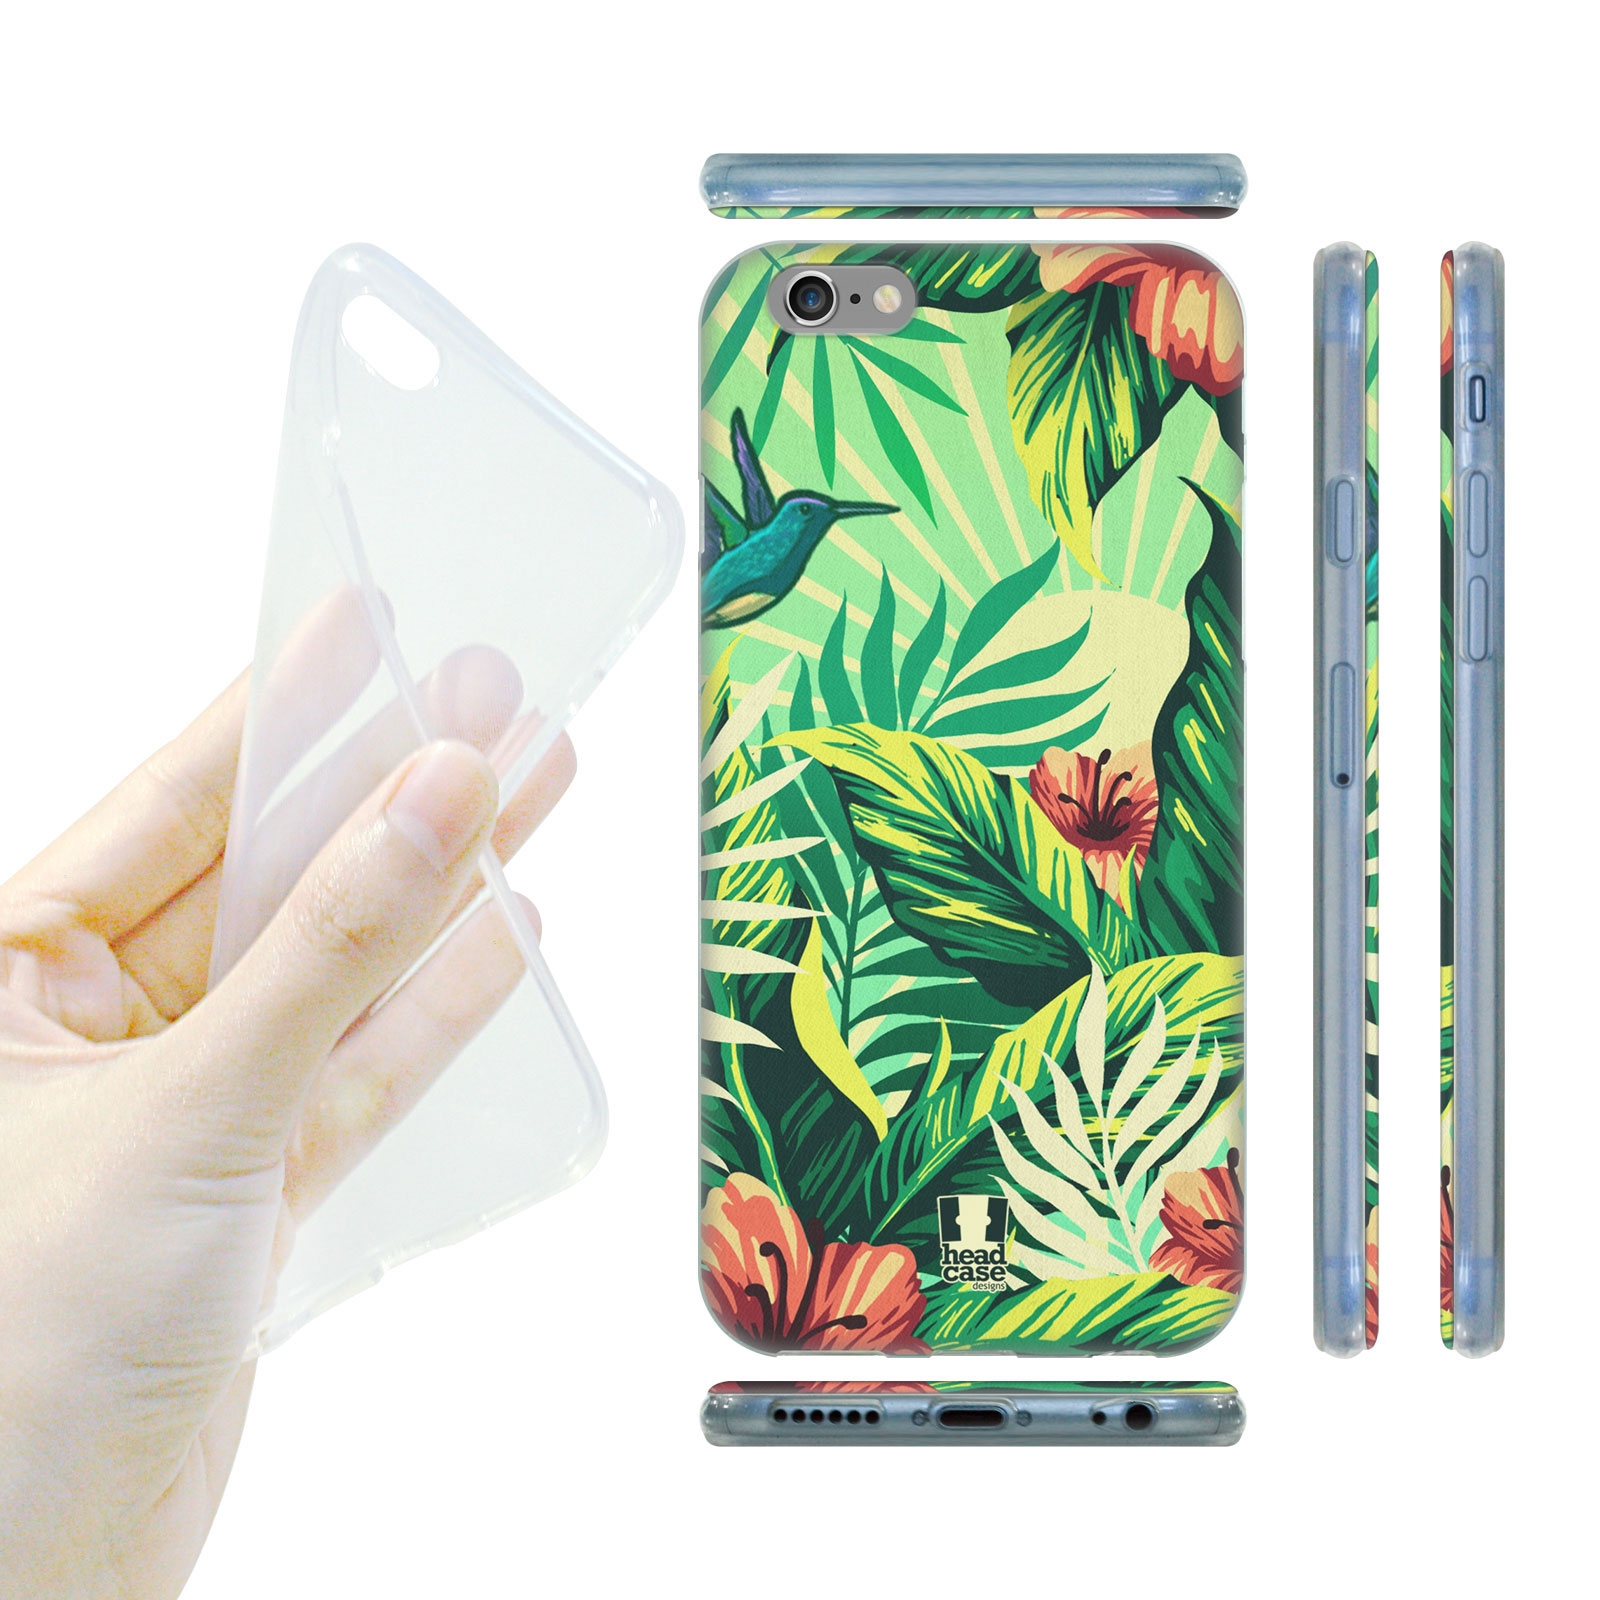 78524192c HEAD CASE Silikonový obal na mobil Iphone 6/6S ostrov kolibřík barevný vzor